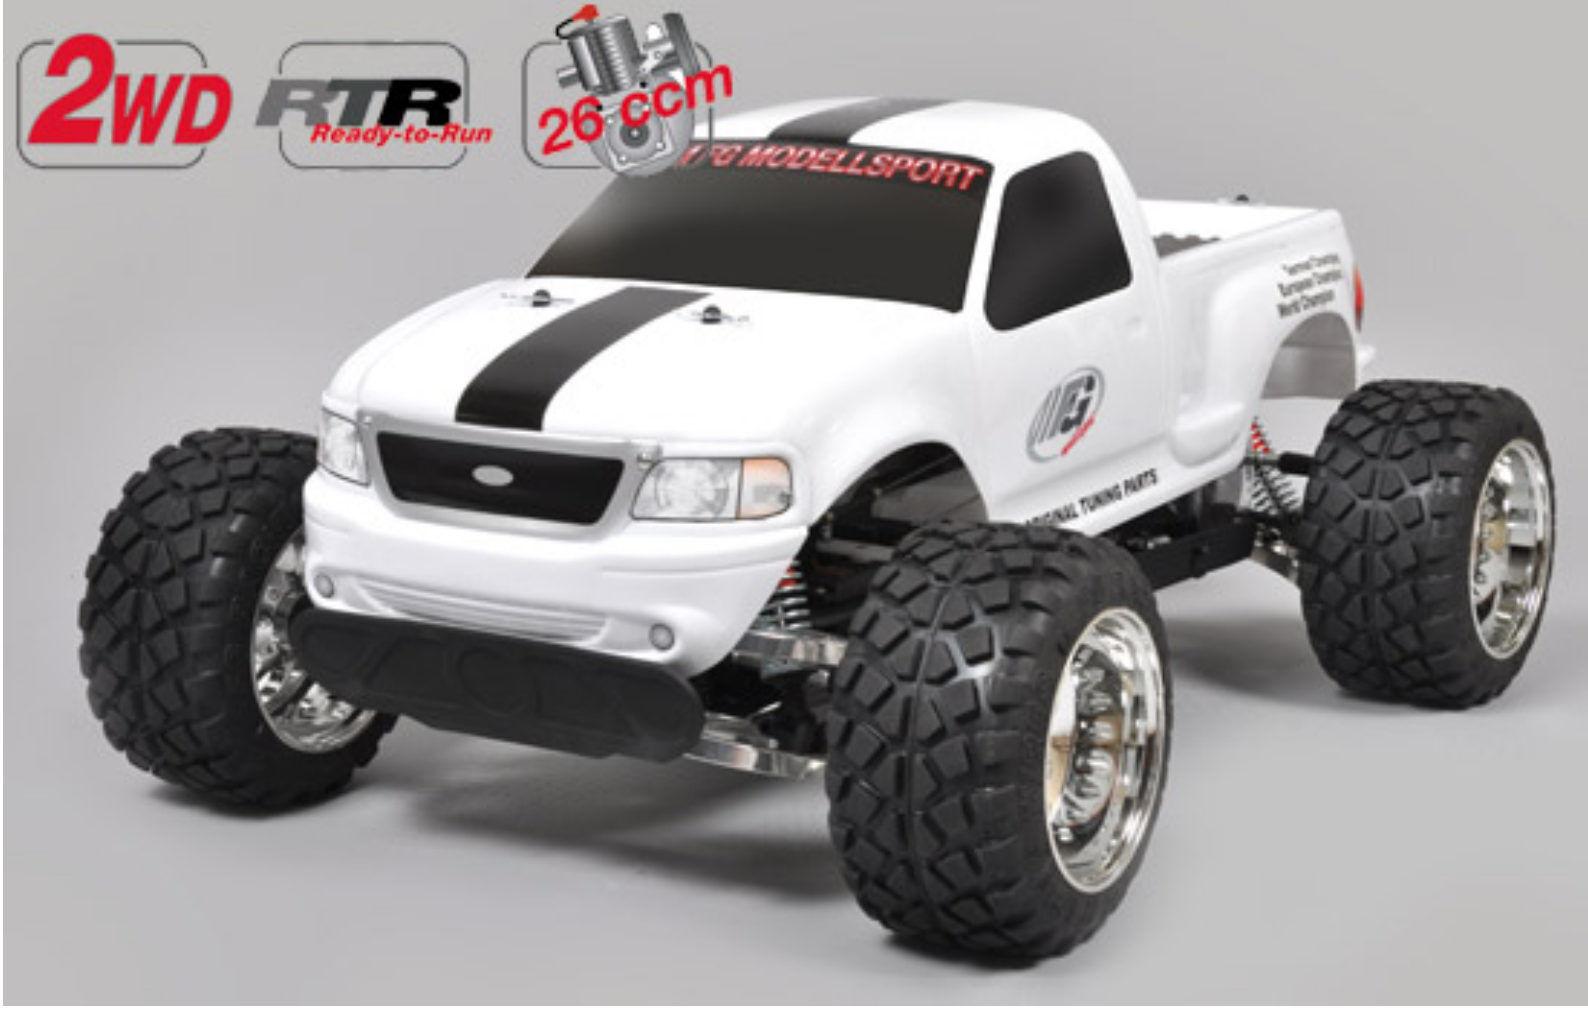 FG modelo Sport estadio Truck Limited Edition rtr pintadas en carrocería 6010rc